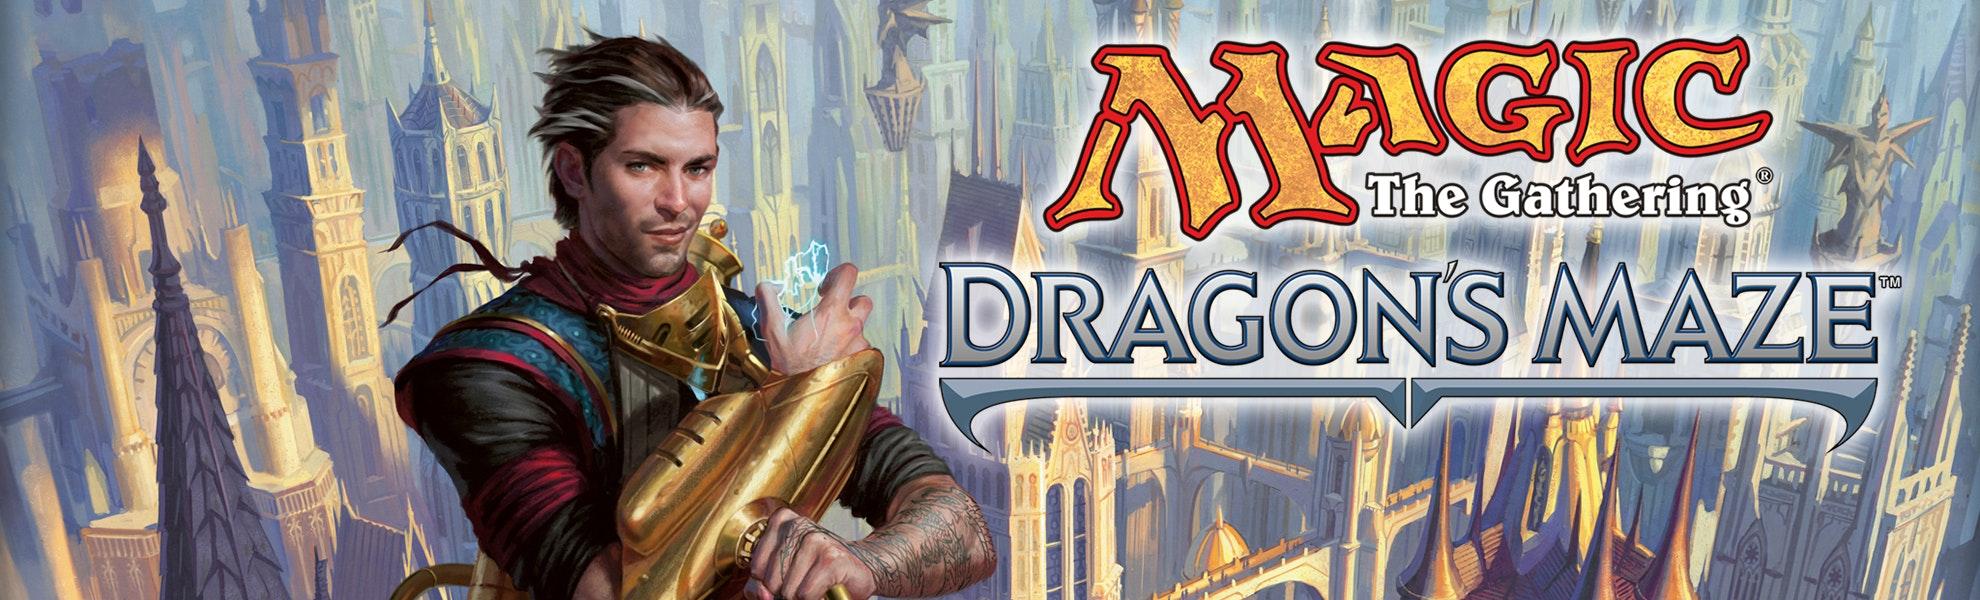 Dragon's Maze Booster Box